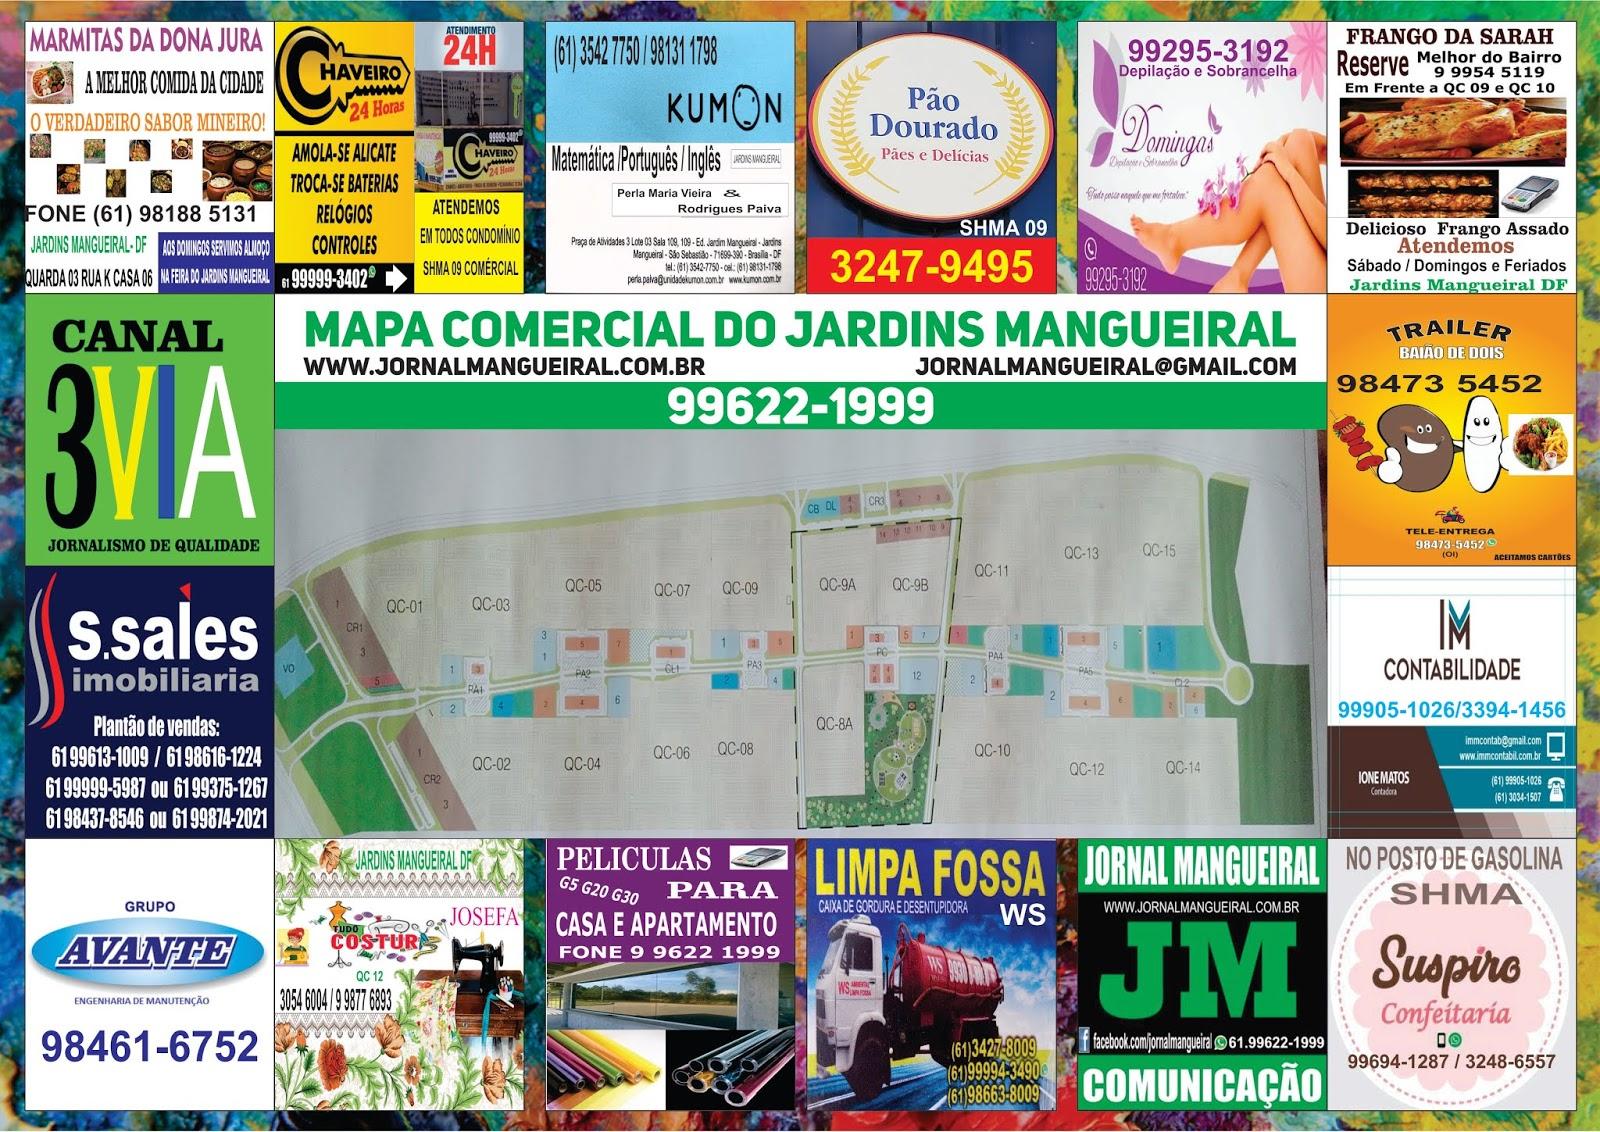 Joel%2BMatos%2B %2BCopia - Caravana itinerante da educaçáo  chega a Brazlândia nesta sexta